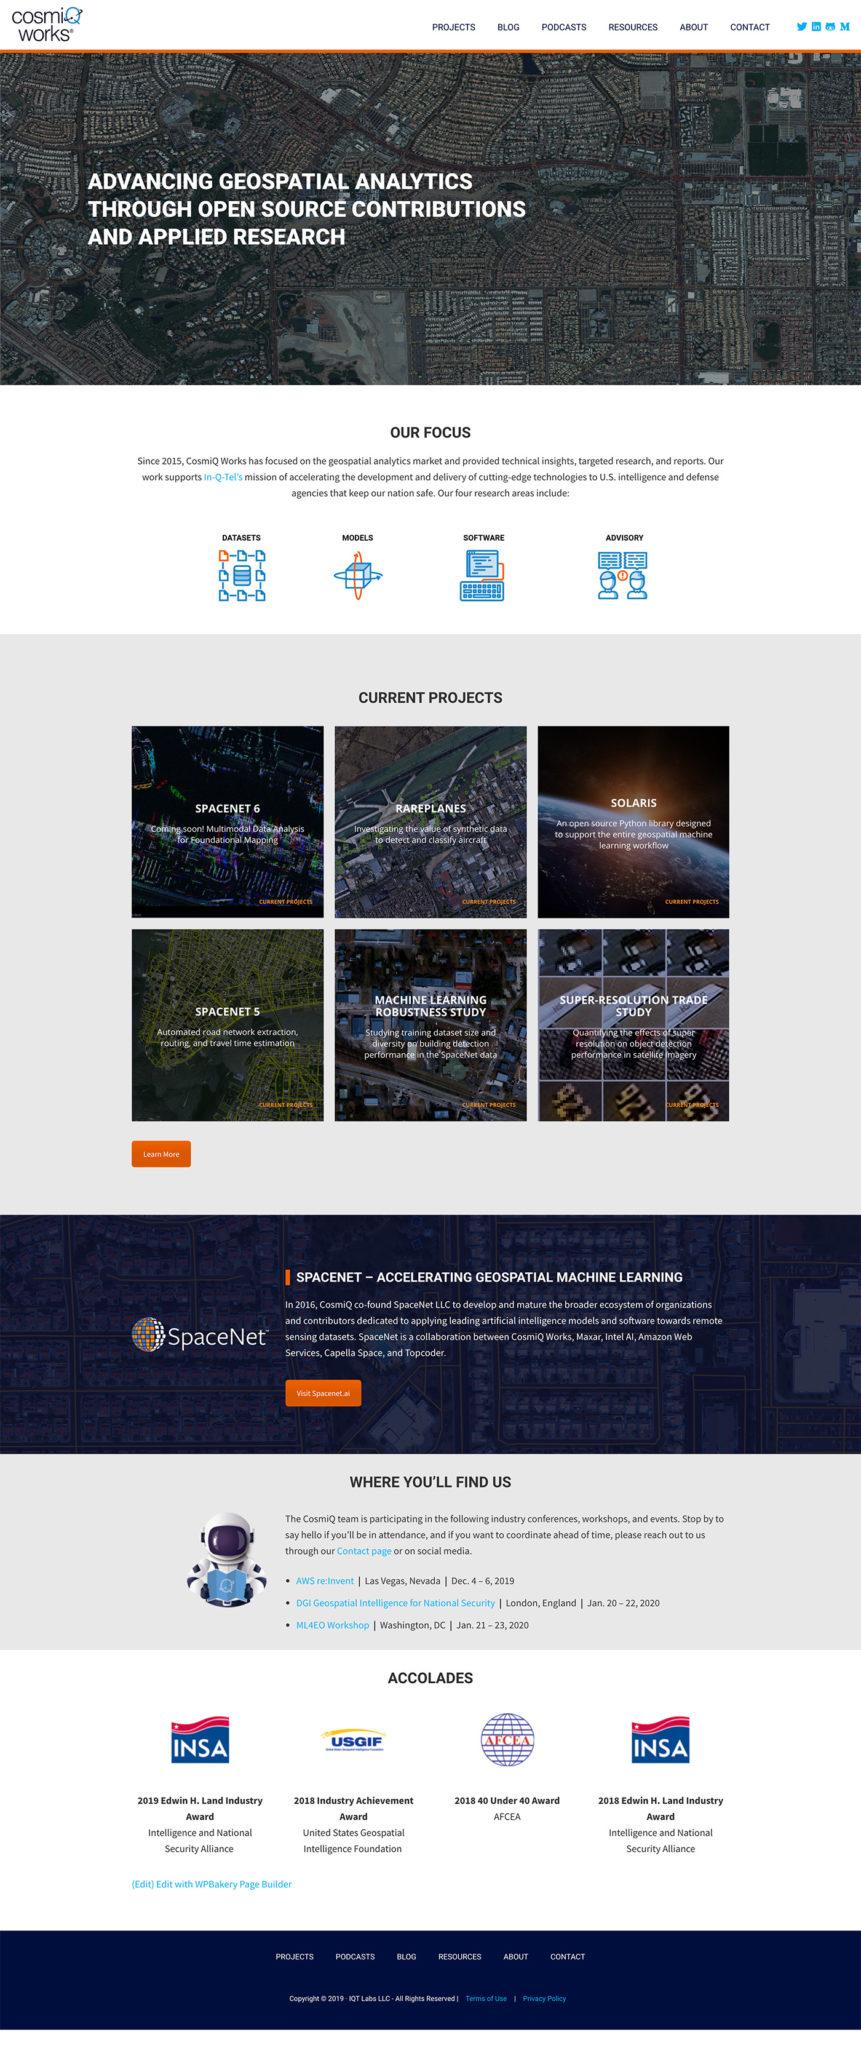 Cosmiqworks Web Design Projects Studio 22 Design